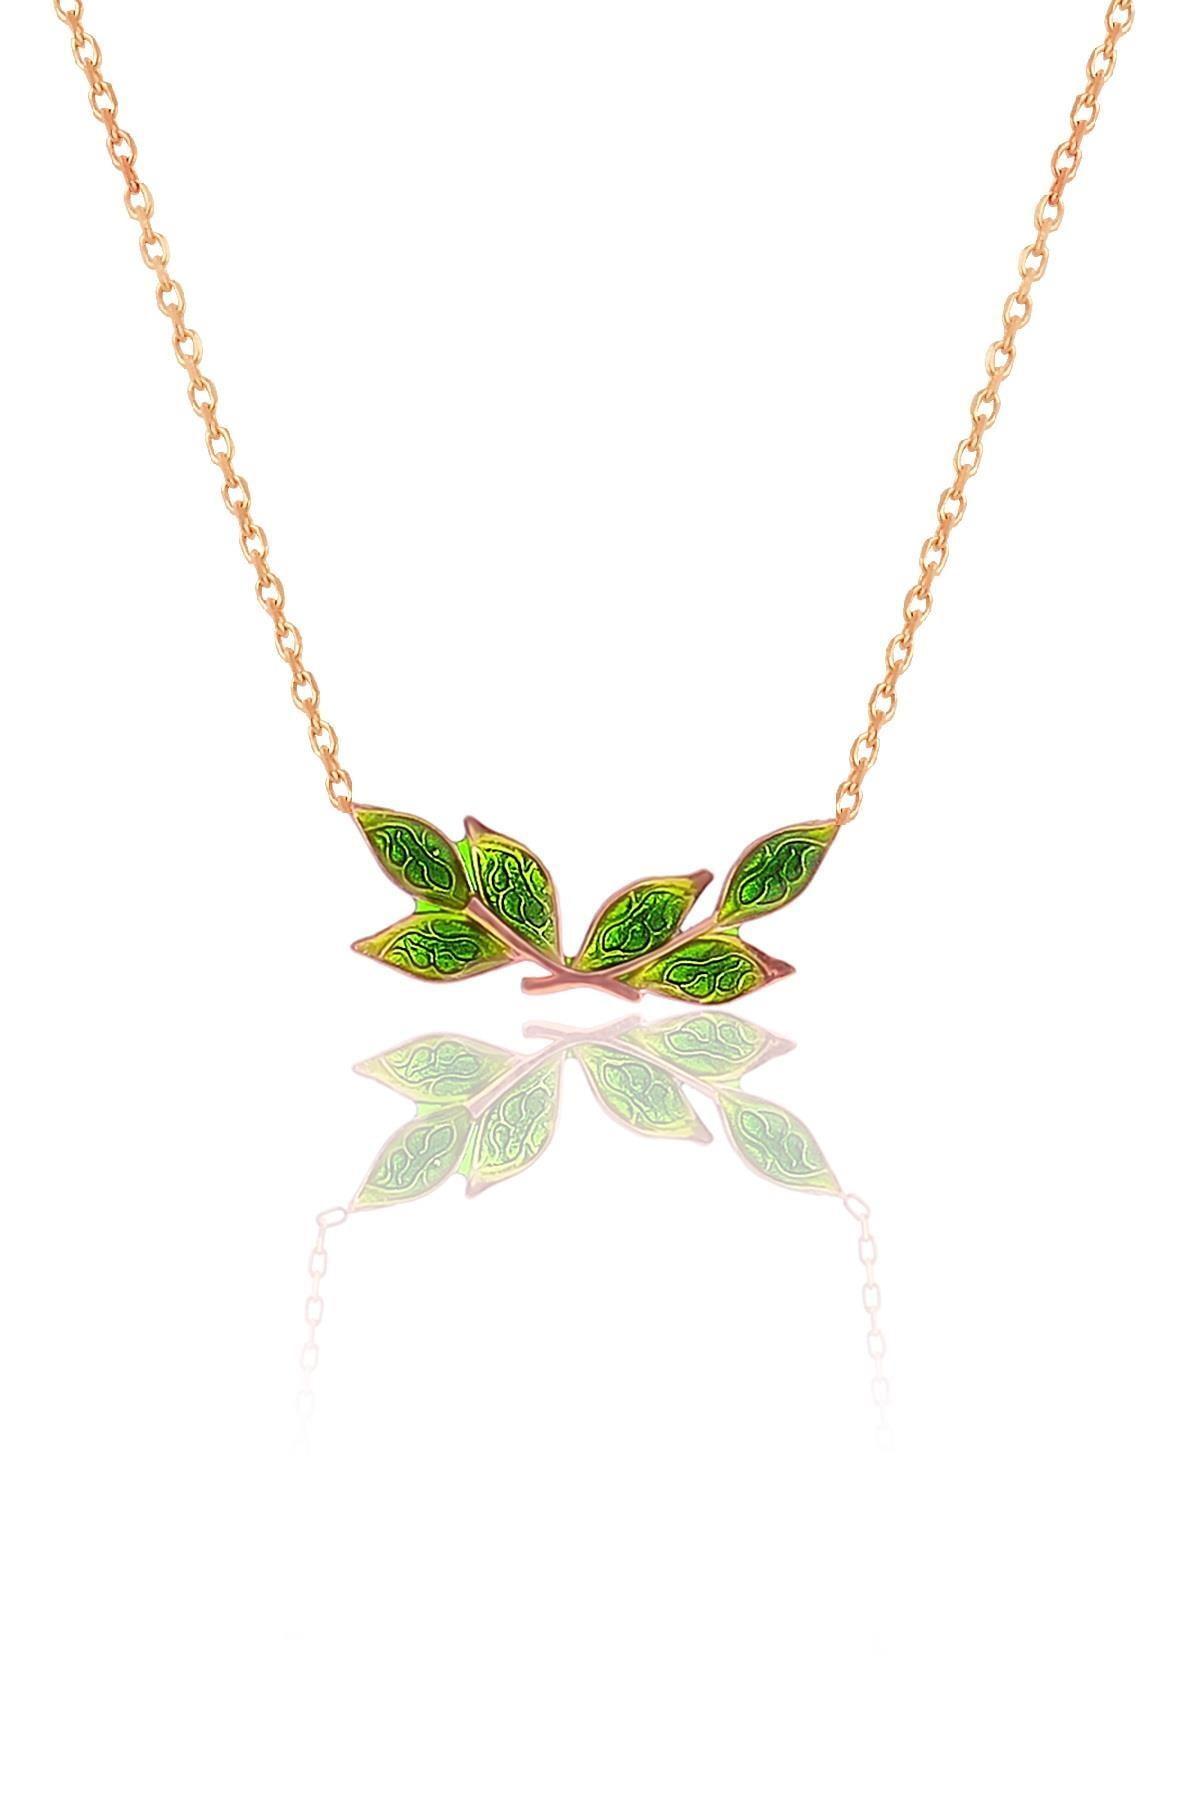 Söğütlü Silver Gümüş Rose Mineli Zeytin Yaprağı Kolye 0